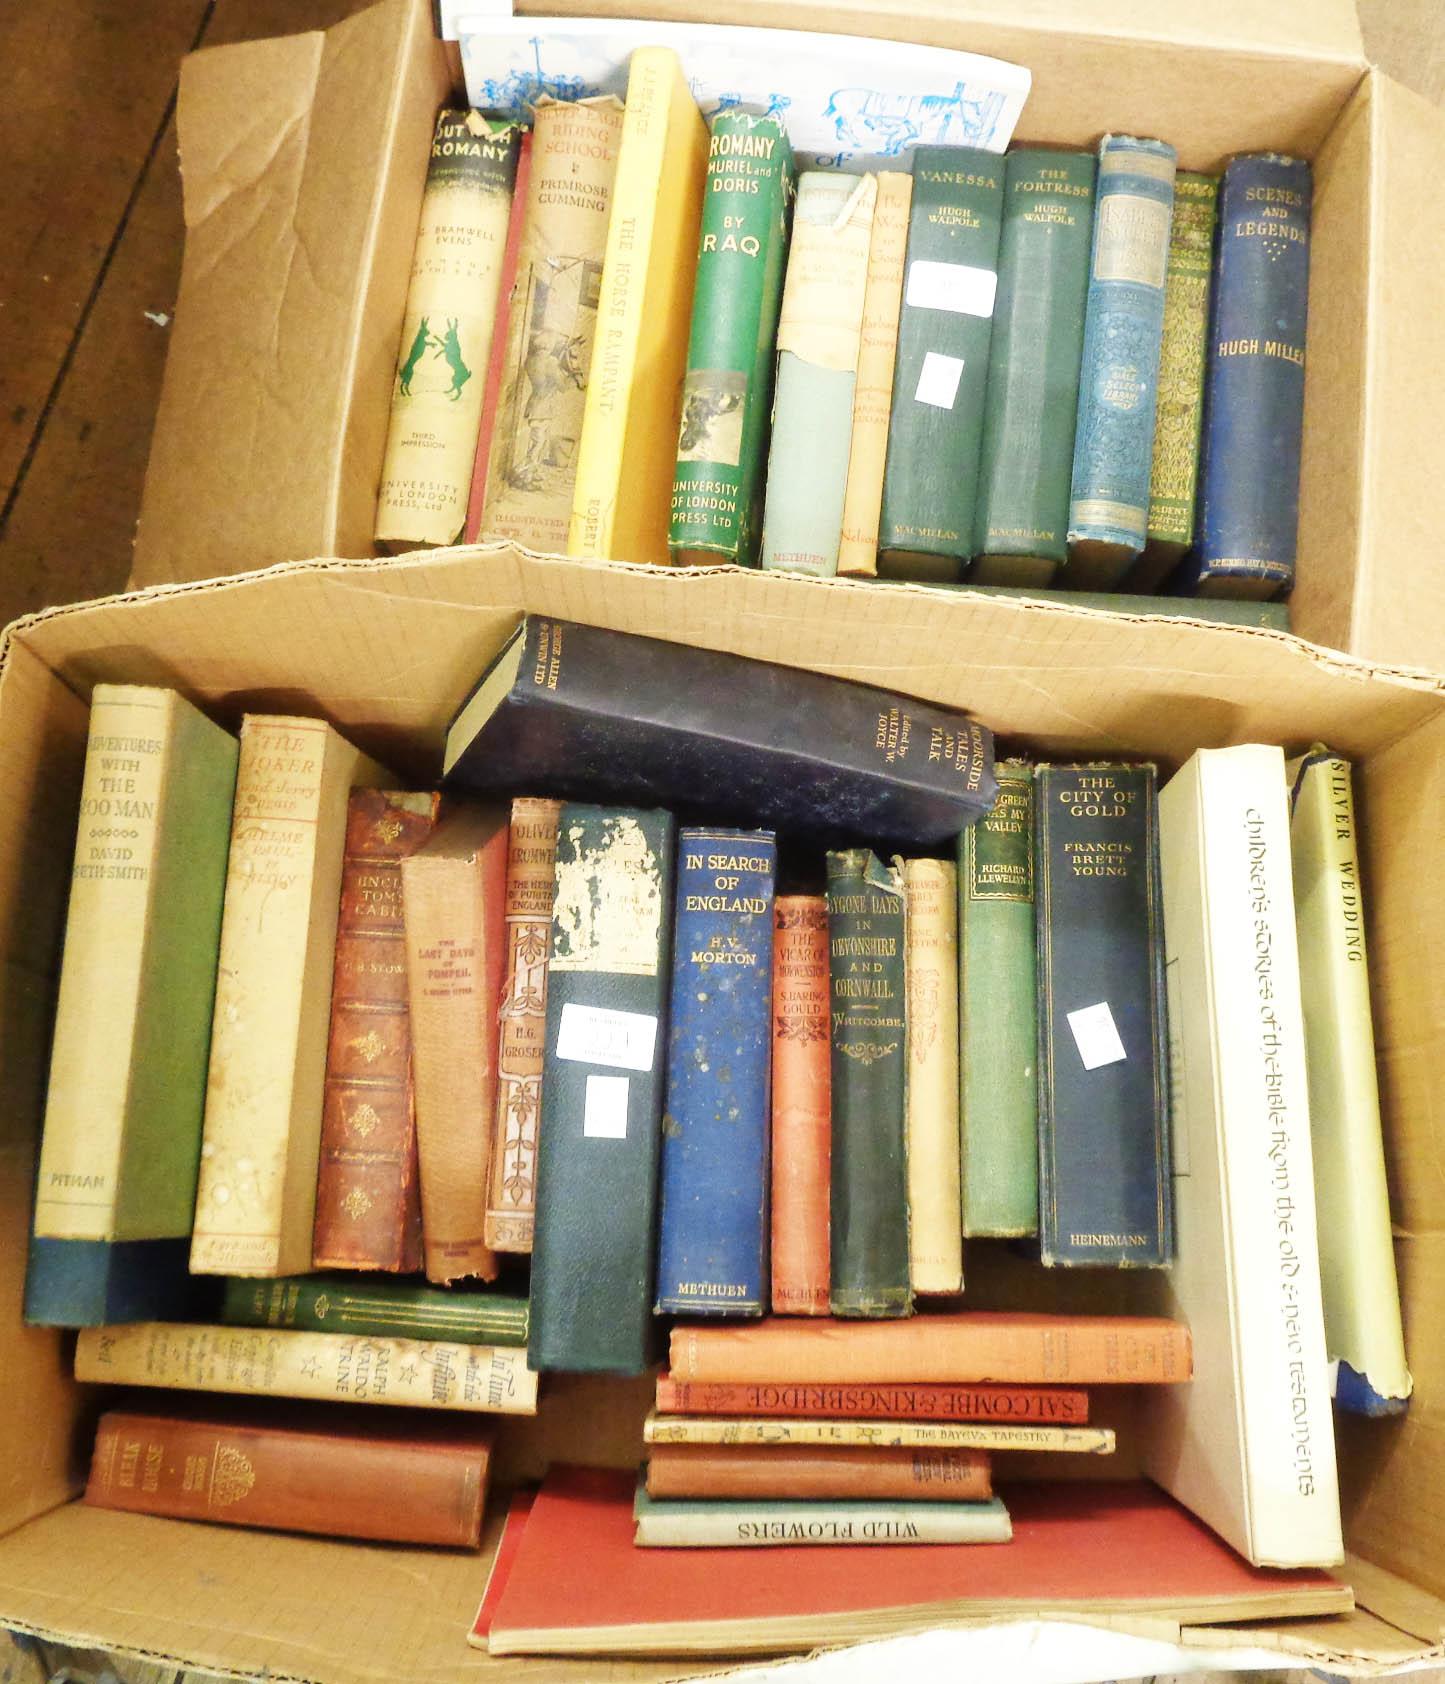 A quantity of mainly hardback books, including Hugh Walpole titles and B.B.C.'s Romany titles, etc.